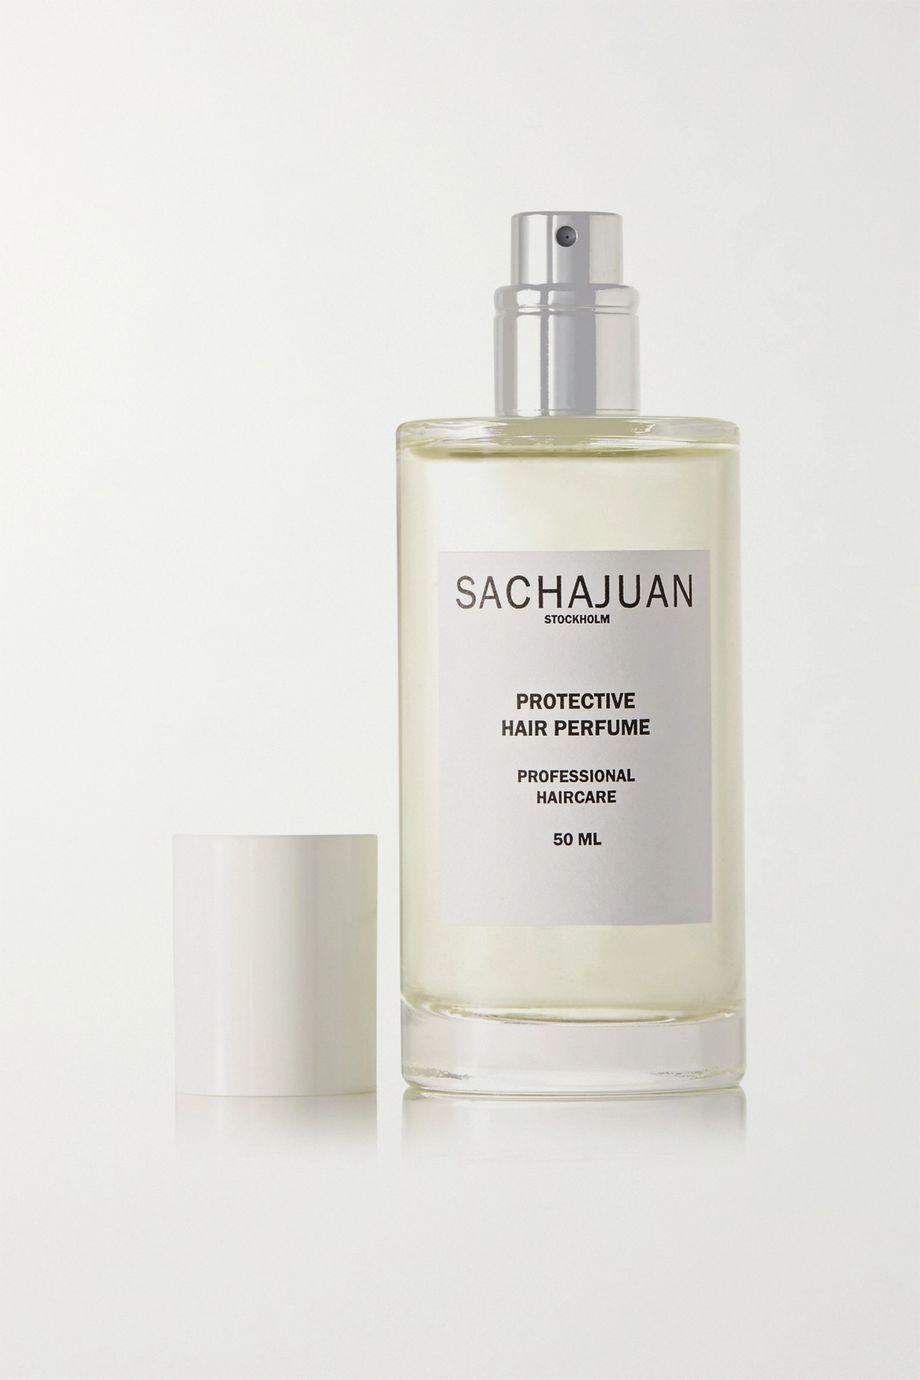 SACHAJUAN Protective Hair Perfume, 50 ml – Haarparfum